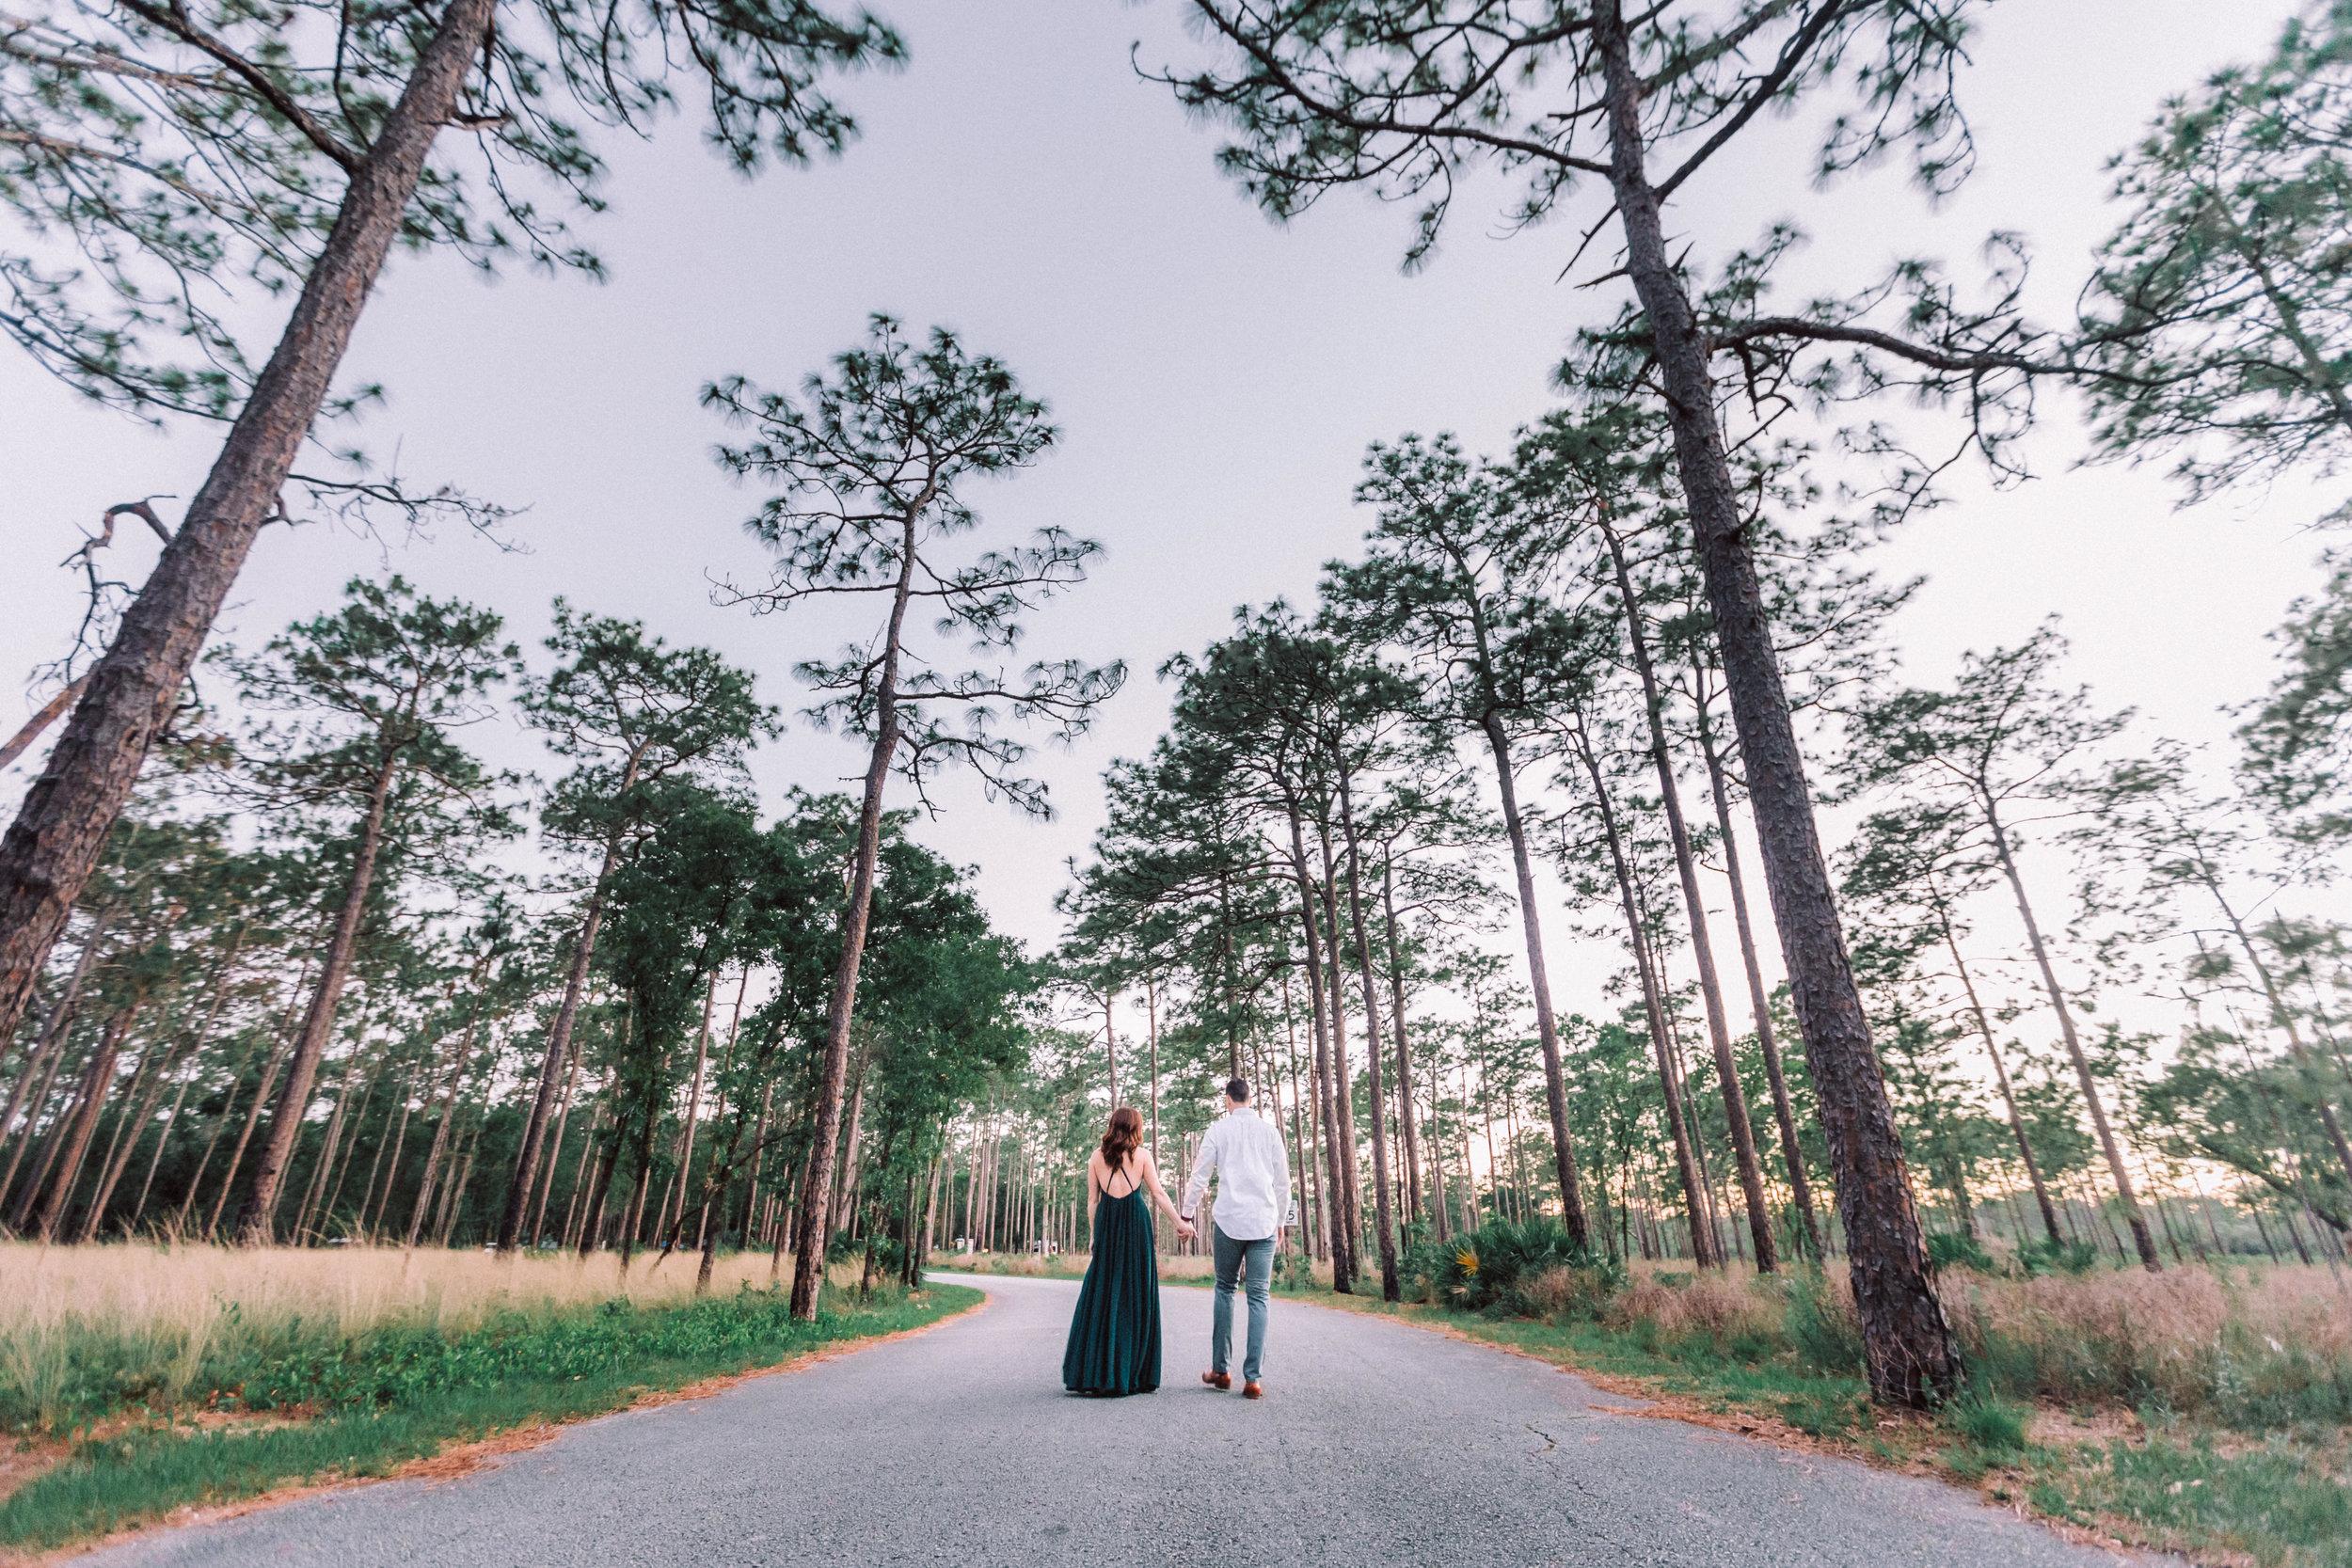 Orlando Engagement session at Wekiva Springs State Park nature-Anthony + Christine 70.jpg